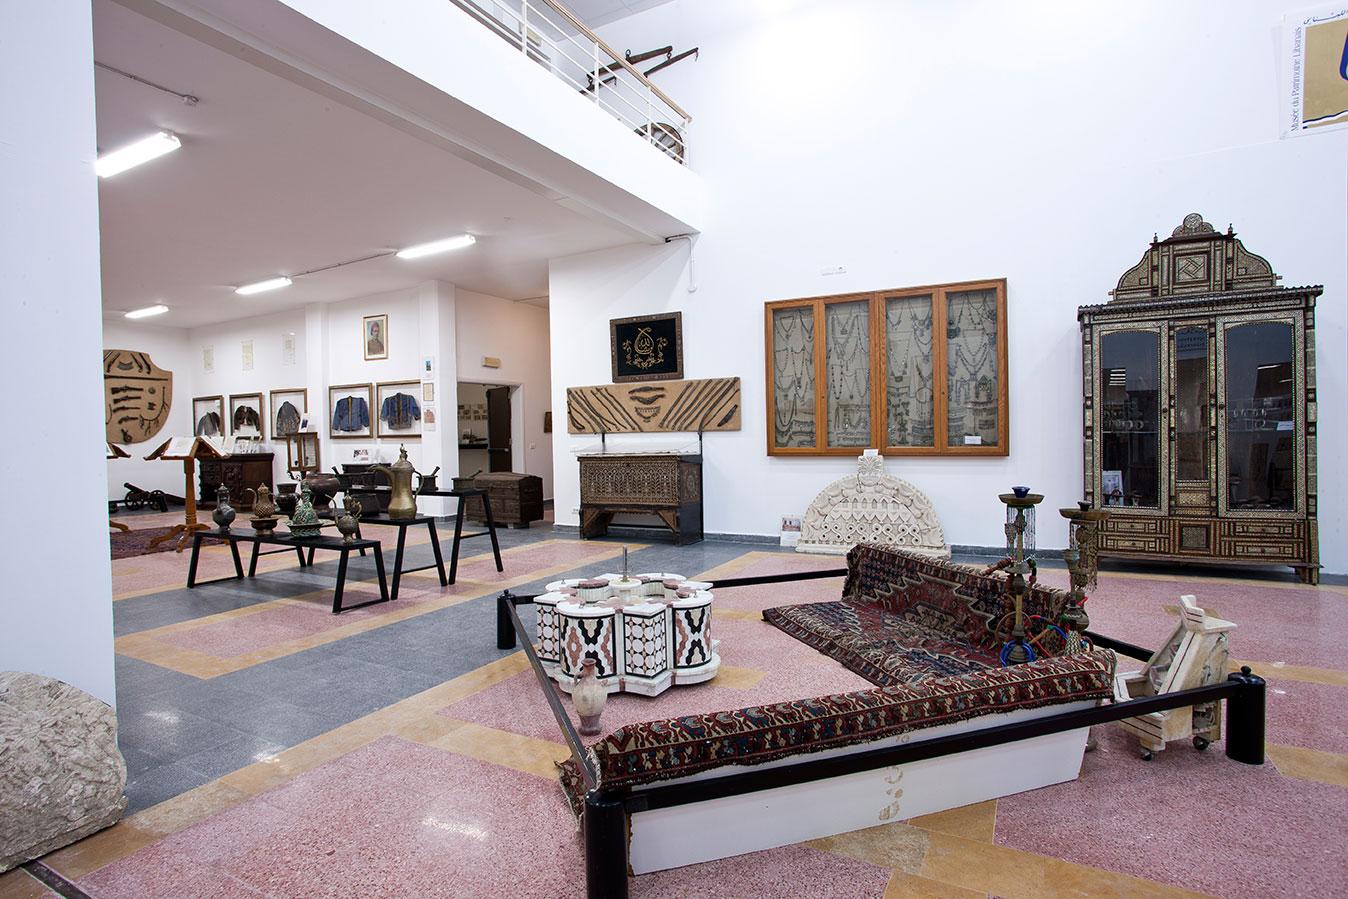 Inside Lebanese Heritage Museum